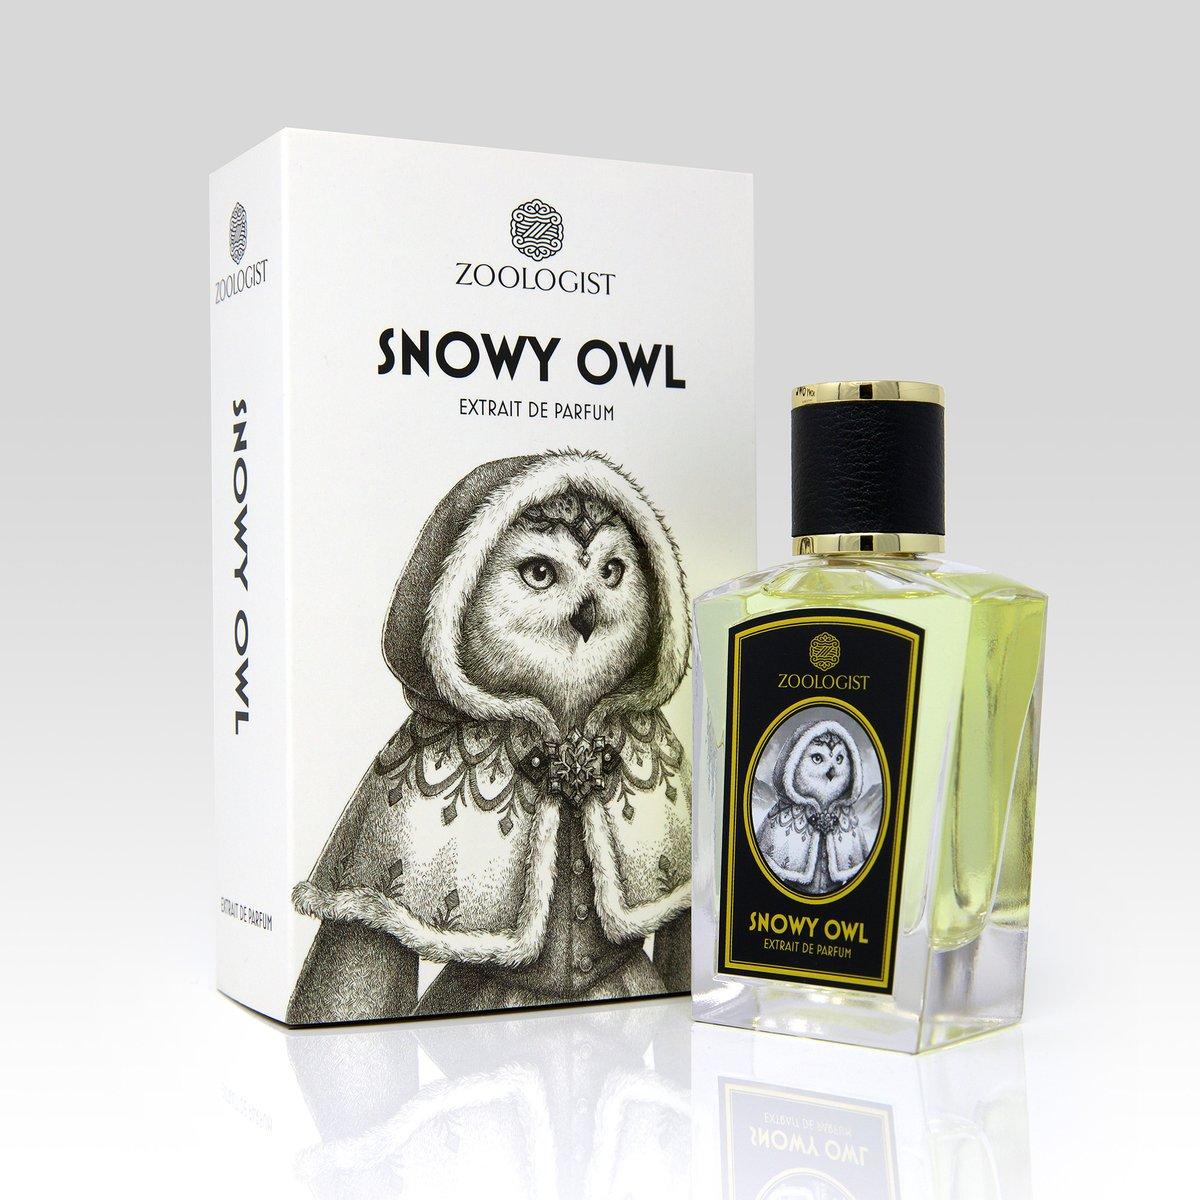 Snowy Owl Zoologist